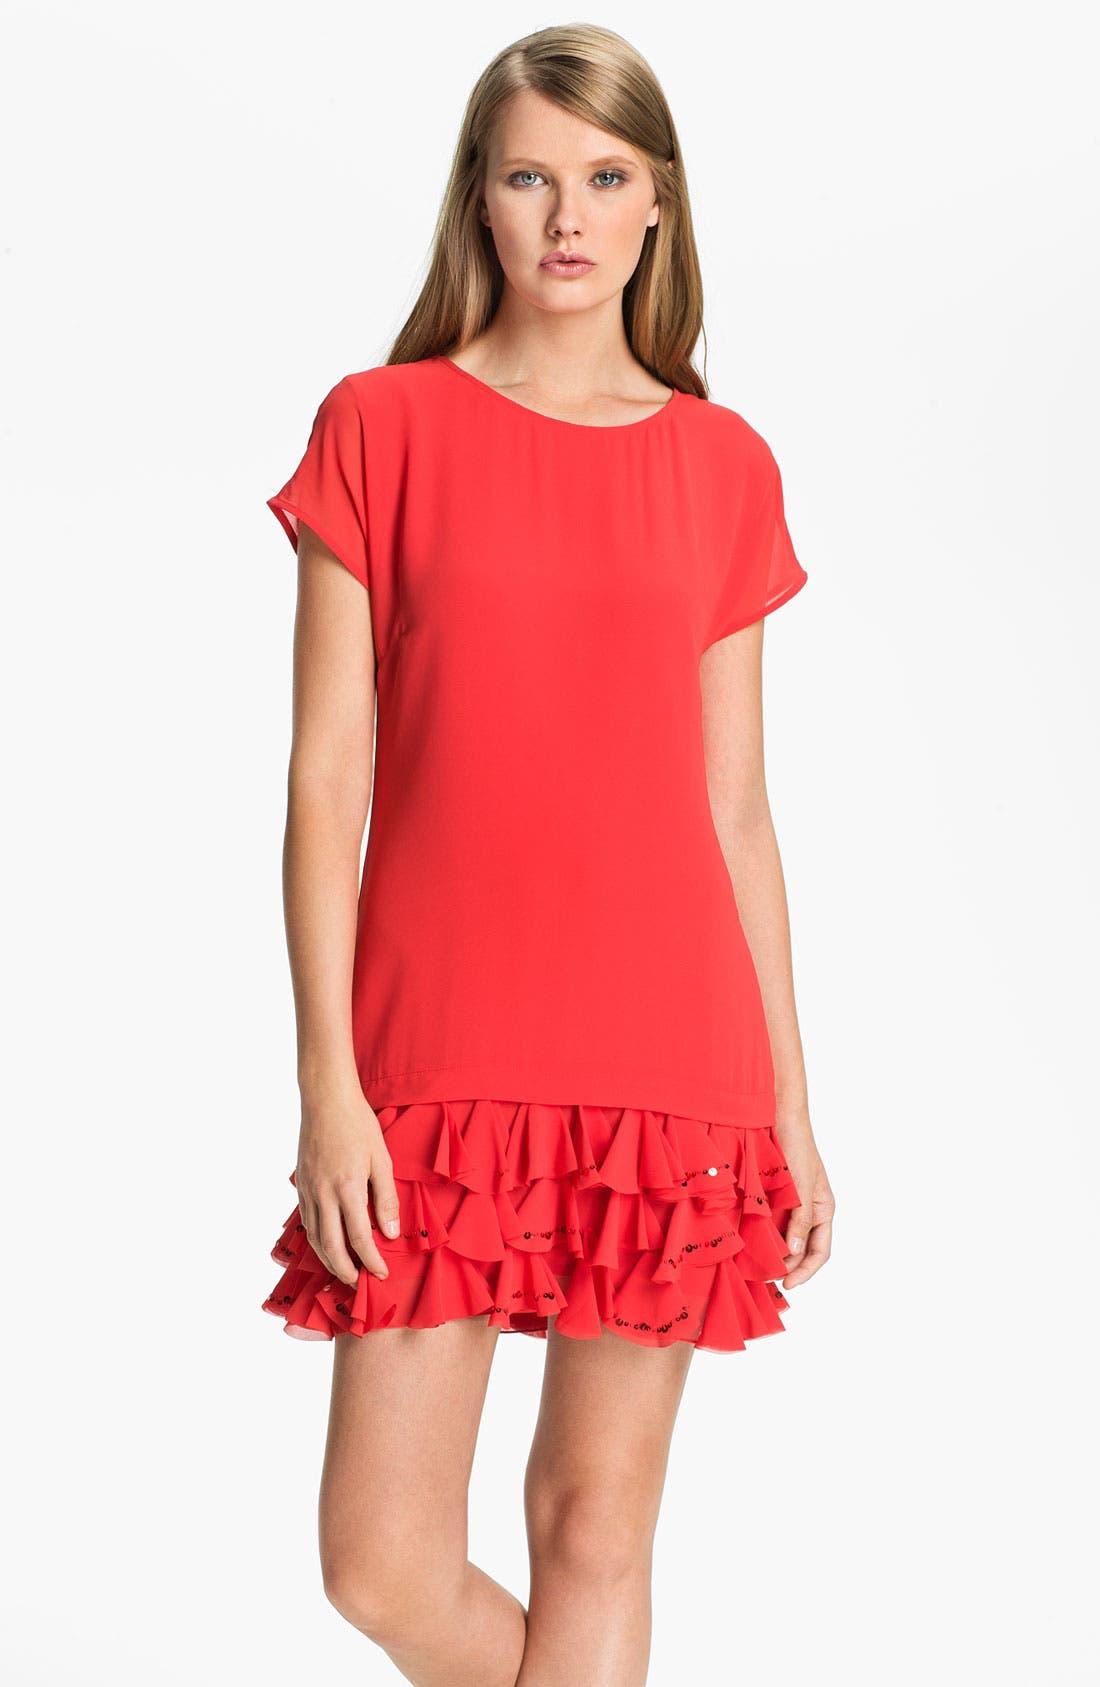 Alternate Image 1 Selected - Ted Baker London Ruffle Tunic Dress